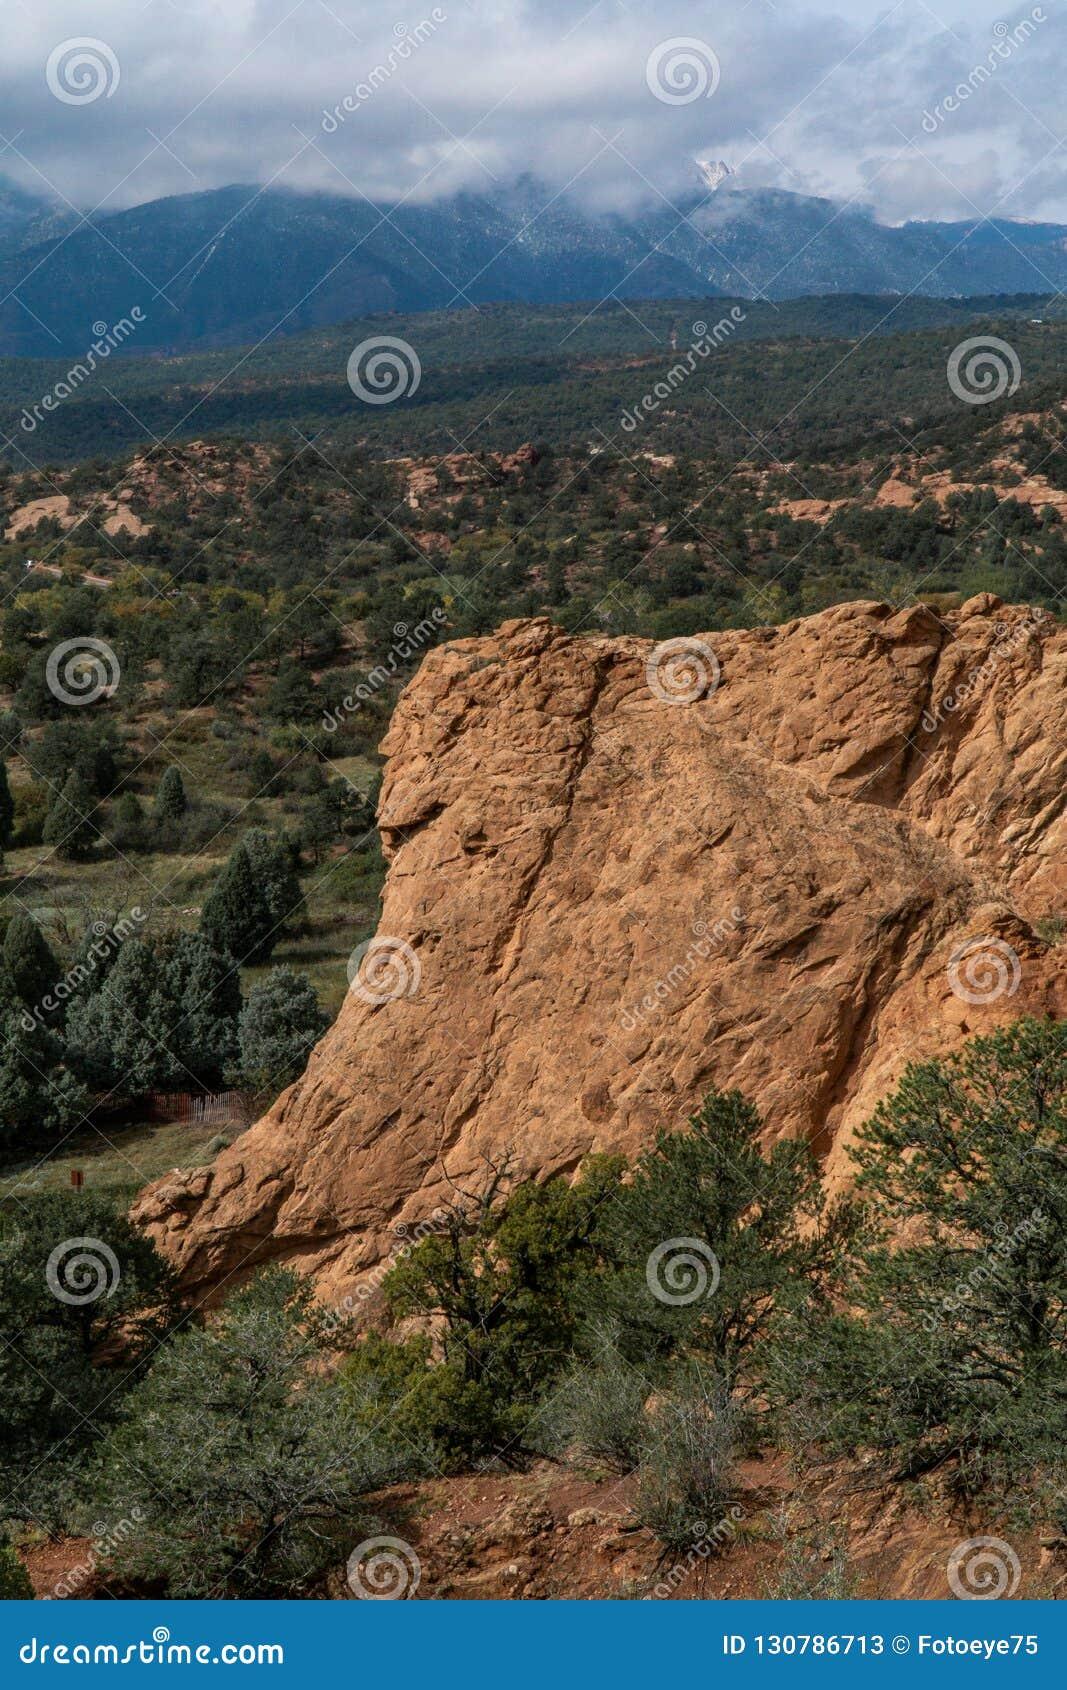 Garden Of The Gods \u0026 Pikes Peak Colorado Springs Rocky